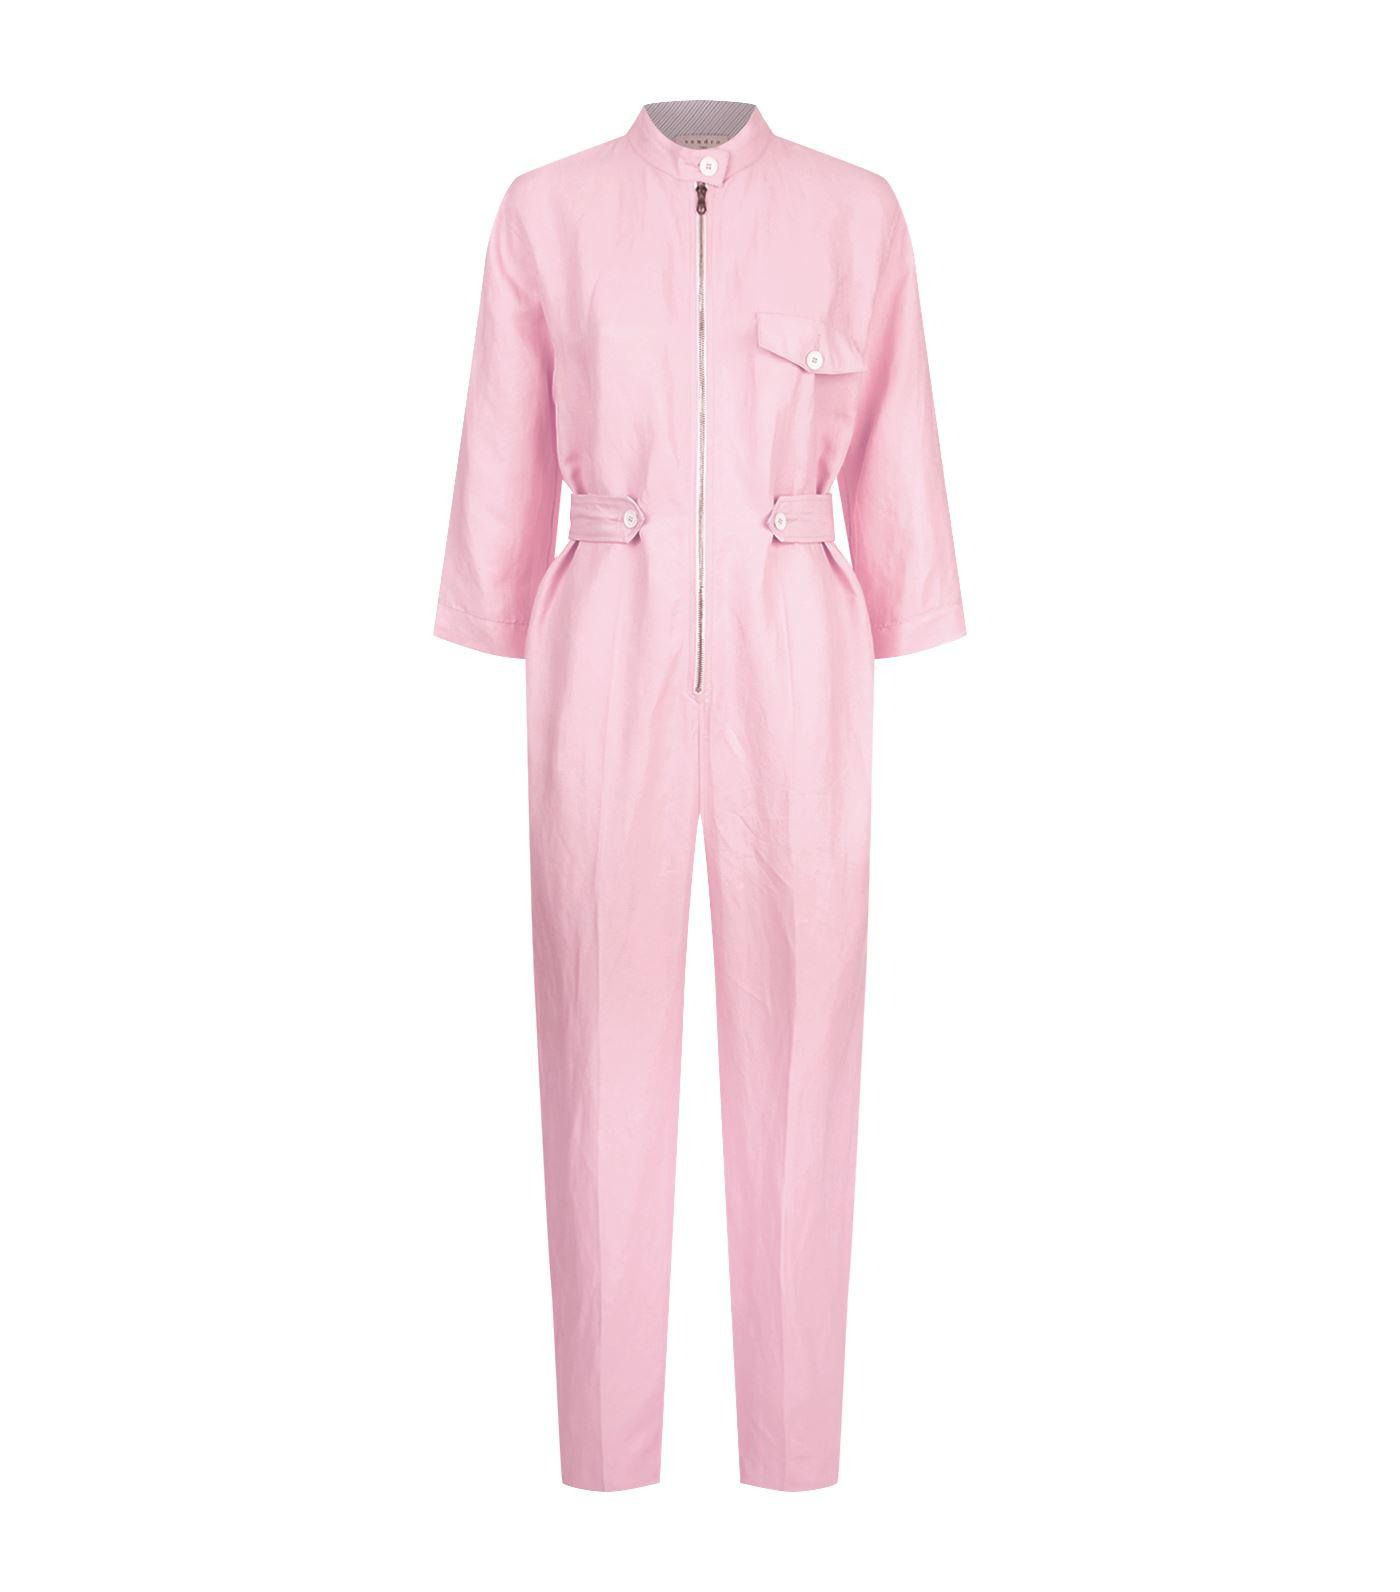 ec9a5ec4f495 Sandro Zipped Slim-leg Jumpsuit in Pink - Lyst